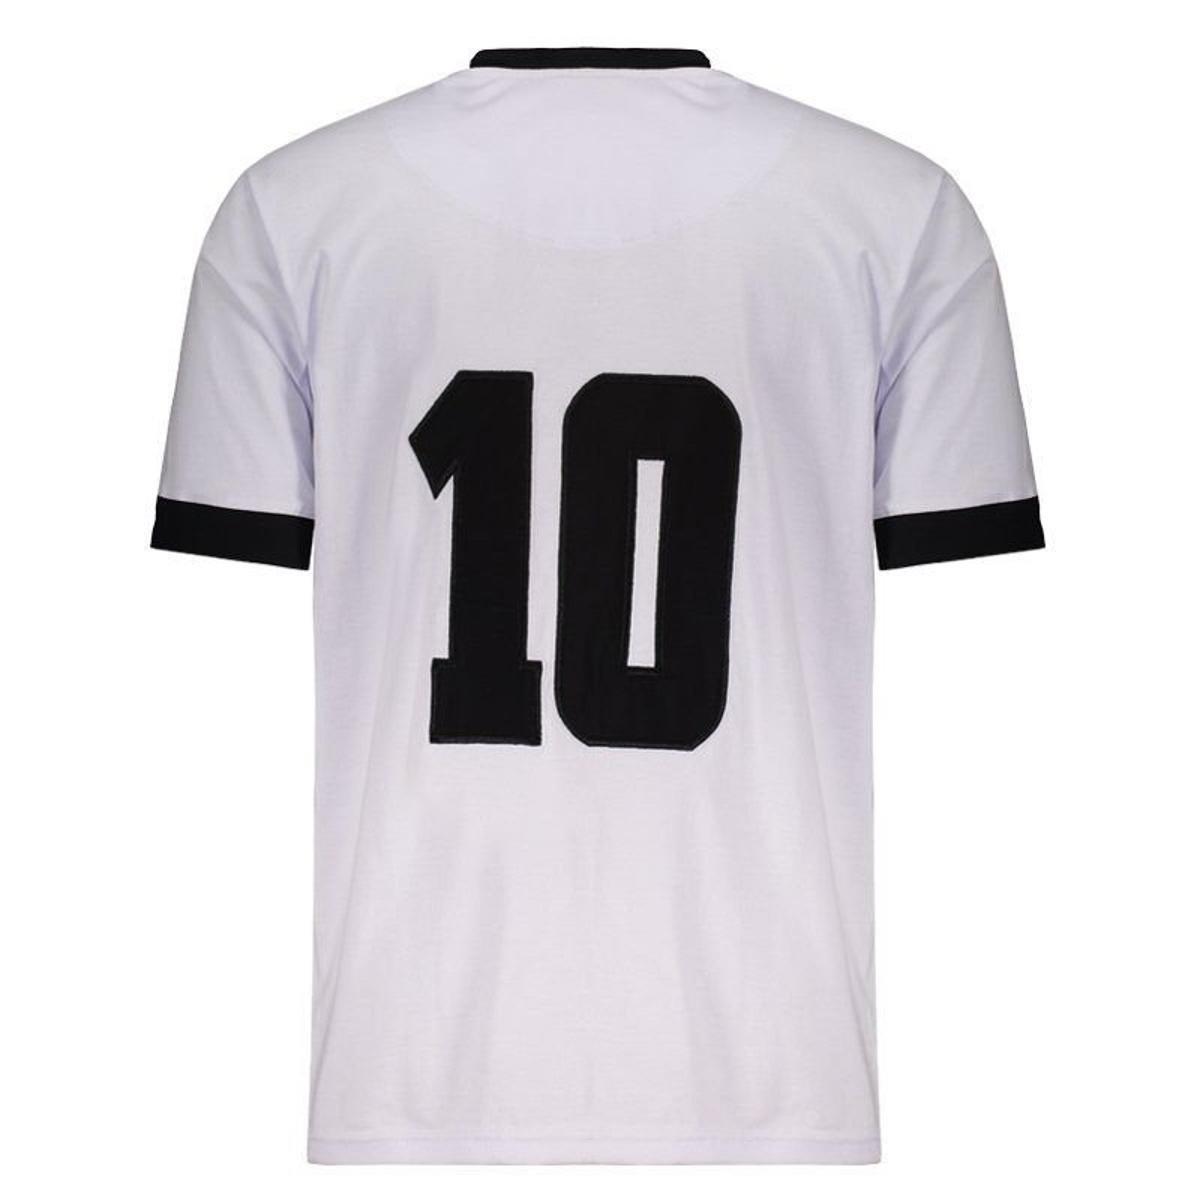 Camisa Alemanha Ocidental Retrô 1954 N° 10 Masculina - Branco ... 3b80771955776